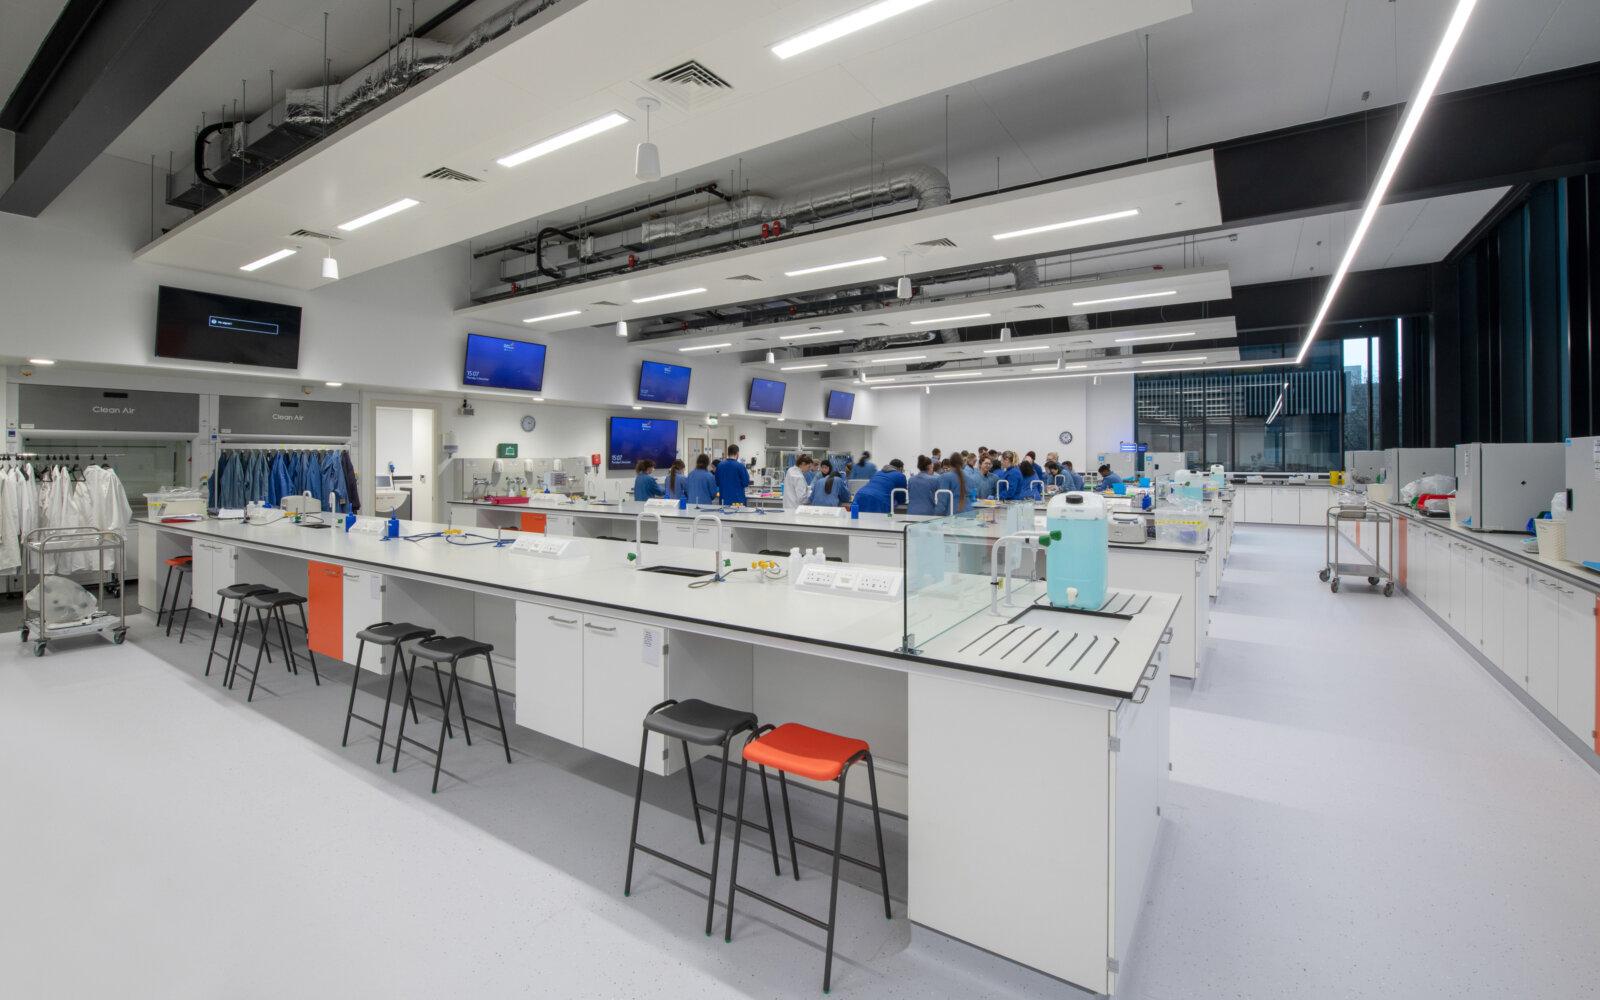 Joseph Priestley East Building University of Huddersfield laboratory